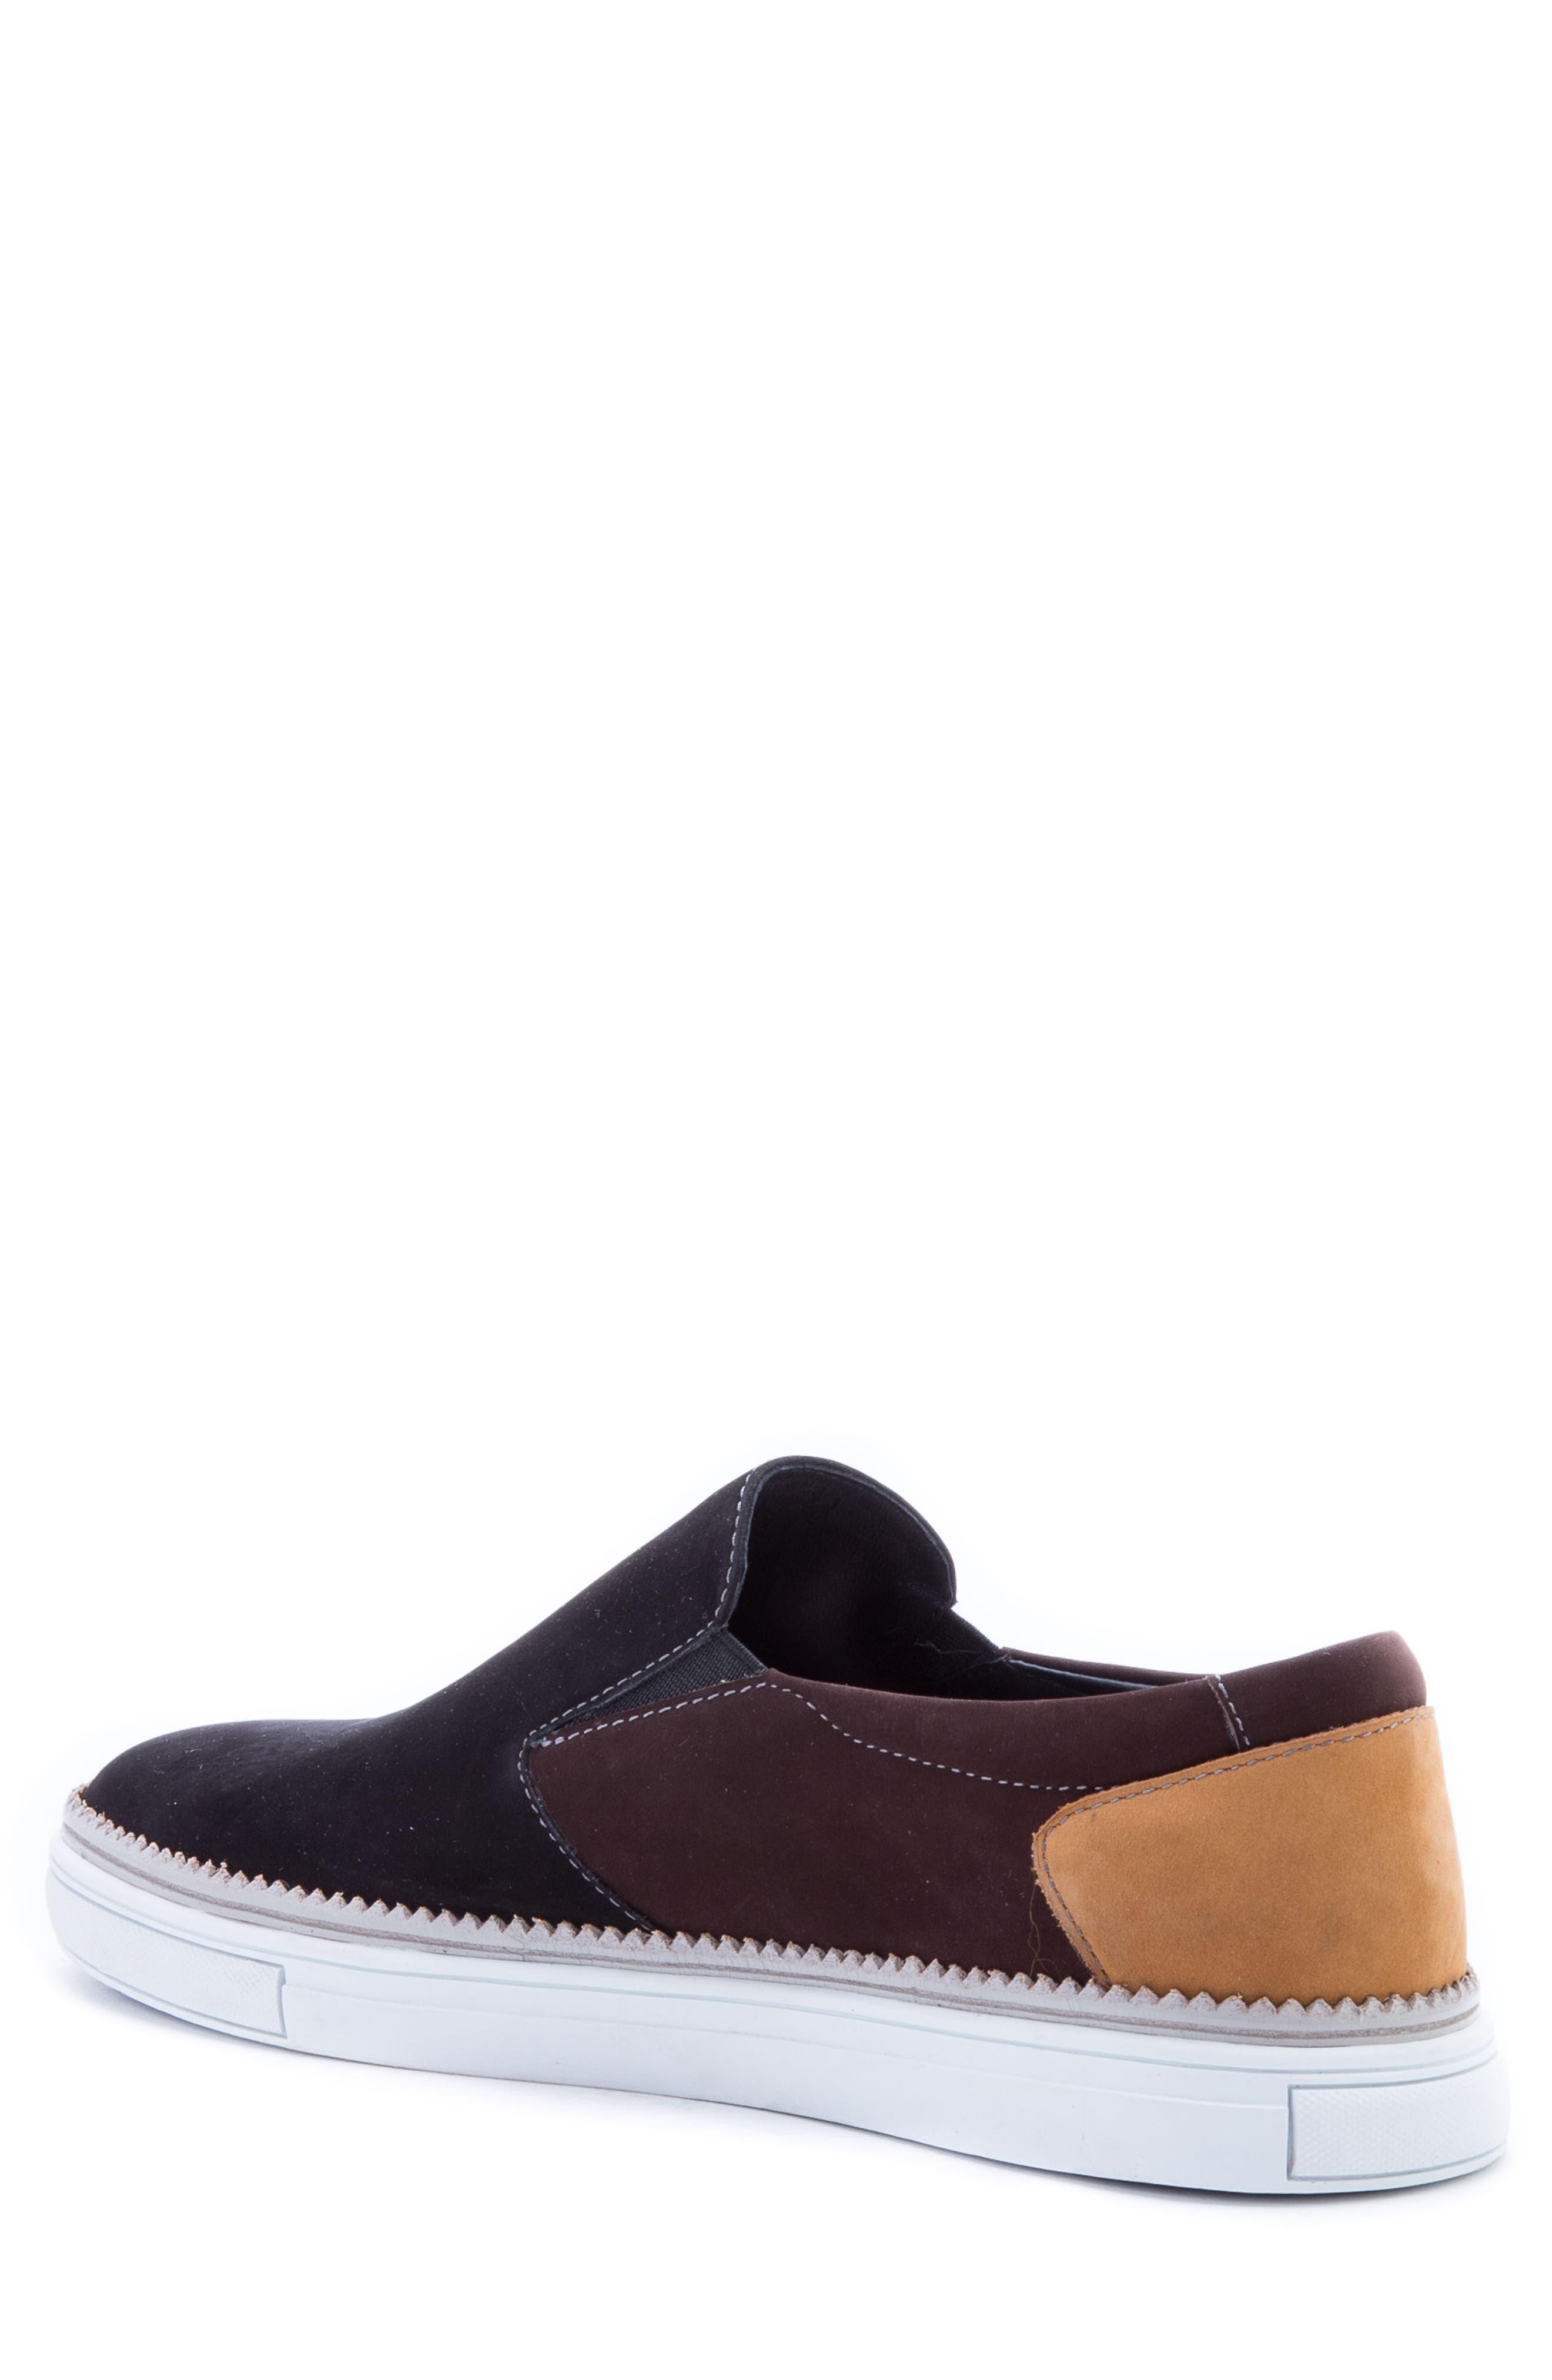 ZANZARA,                             Rivera Colorblocked Slip-On Sneaker,                             Alternate thumbnail 2, color,                             001